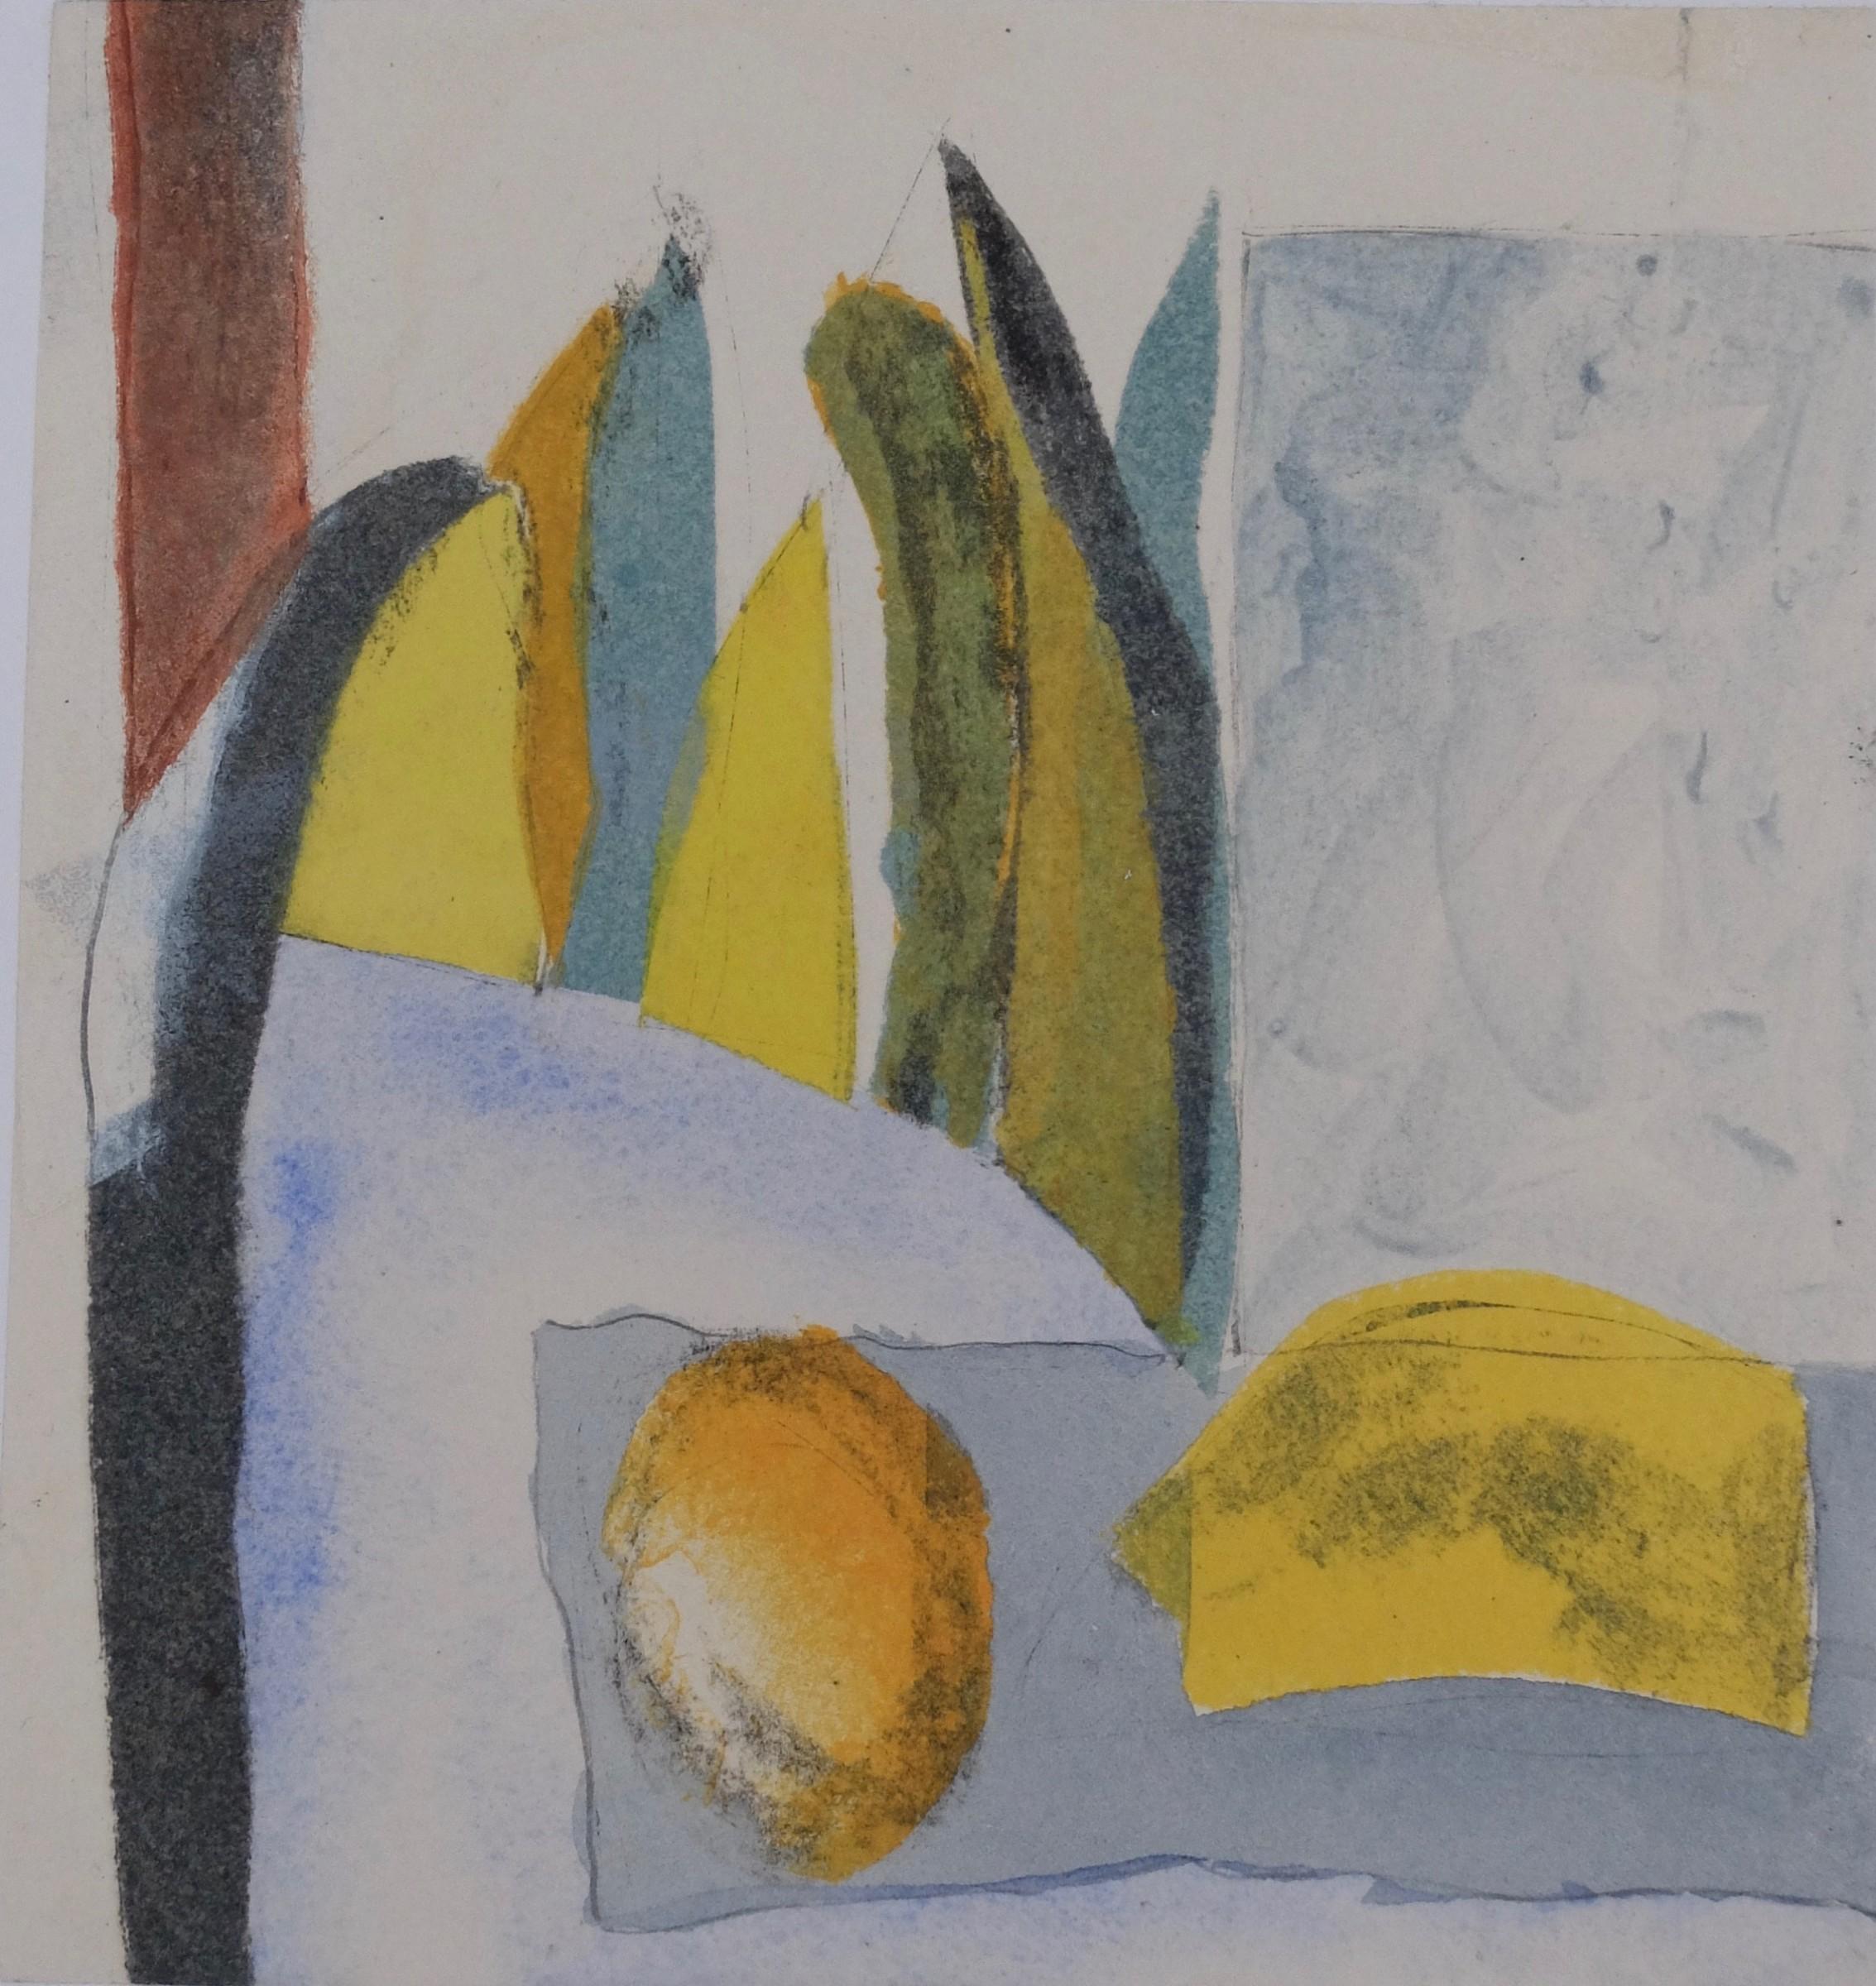 "<span class=""link fancybox-details-link""><a href=""/exhibitions/23/works/artworks_standalone11156/"">View Detail Page</a></span><div class=""artist""><span class=""artist""><strong>Robert Baggaley RE</strong></span></div><div class=""title""><em>Still Life</em></div><div class=""medium"">monotype</div><div class=""dimensions"">27 x 27 cm paper size<br>15 x 14 cm image size</div><div class=""edition_details"">unique</div>"